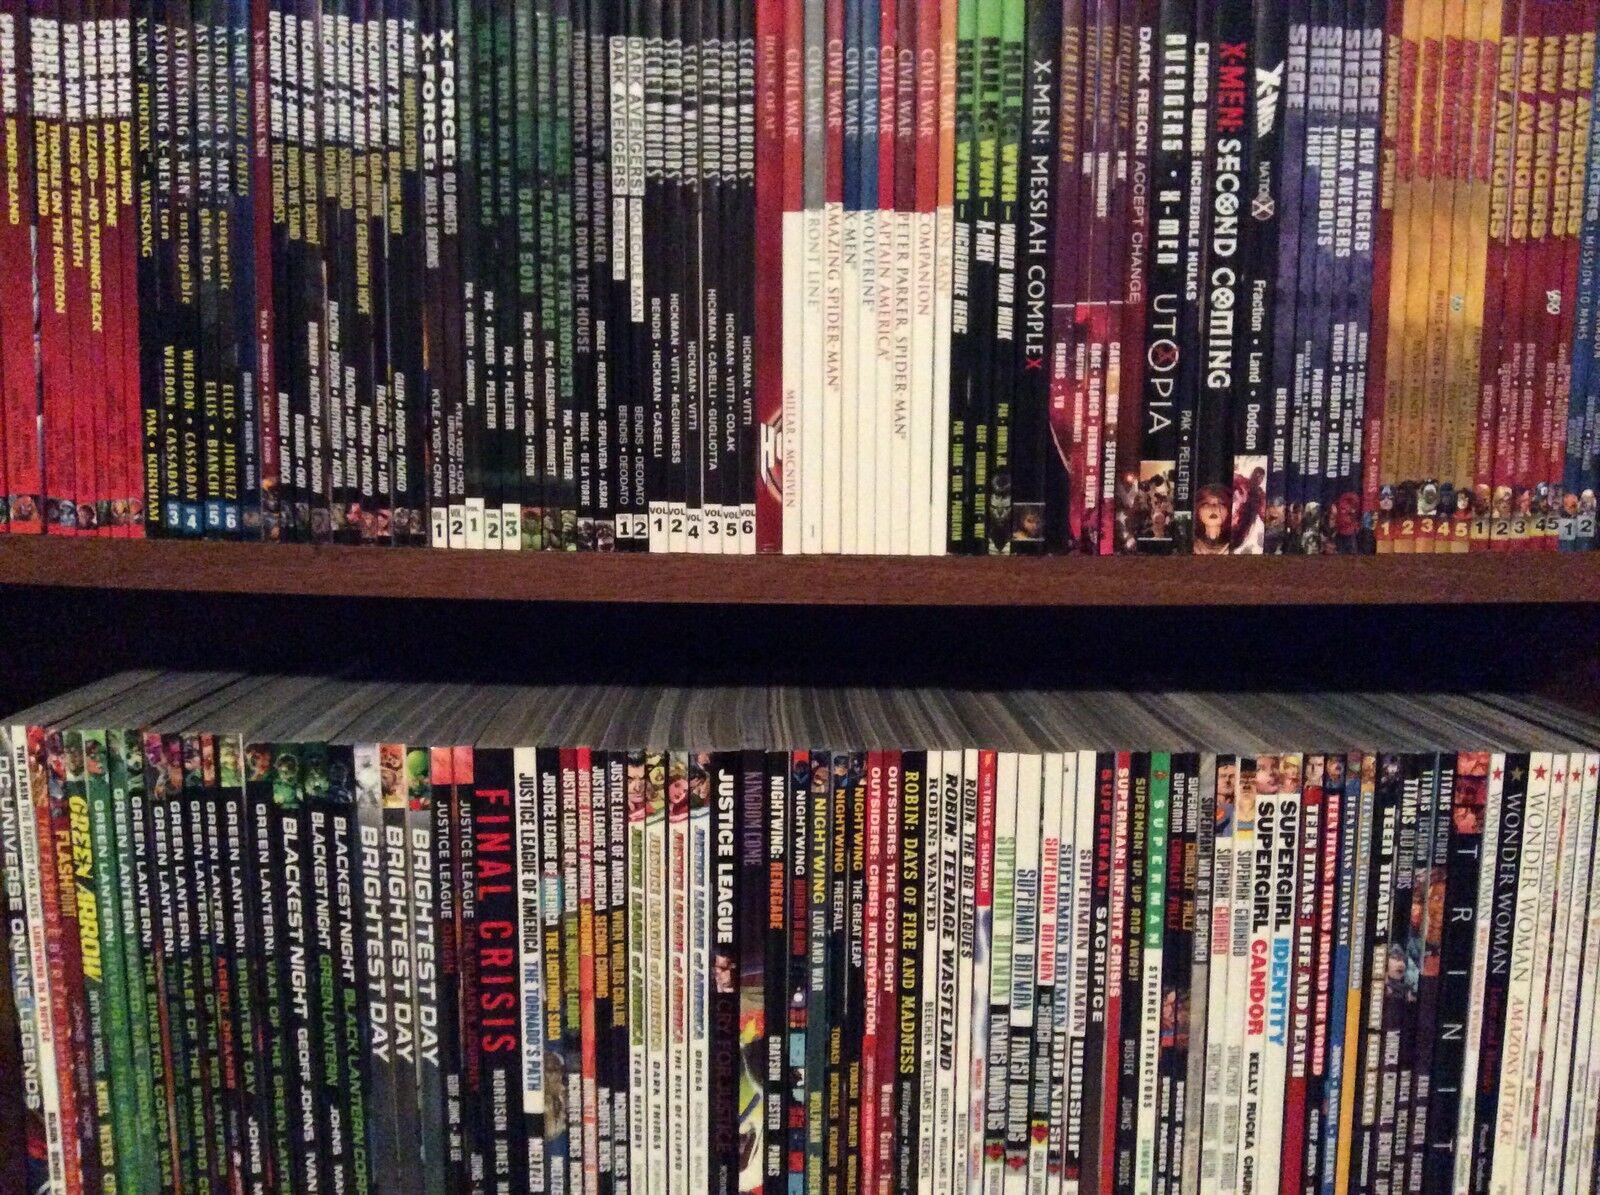 Jens Comics and More